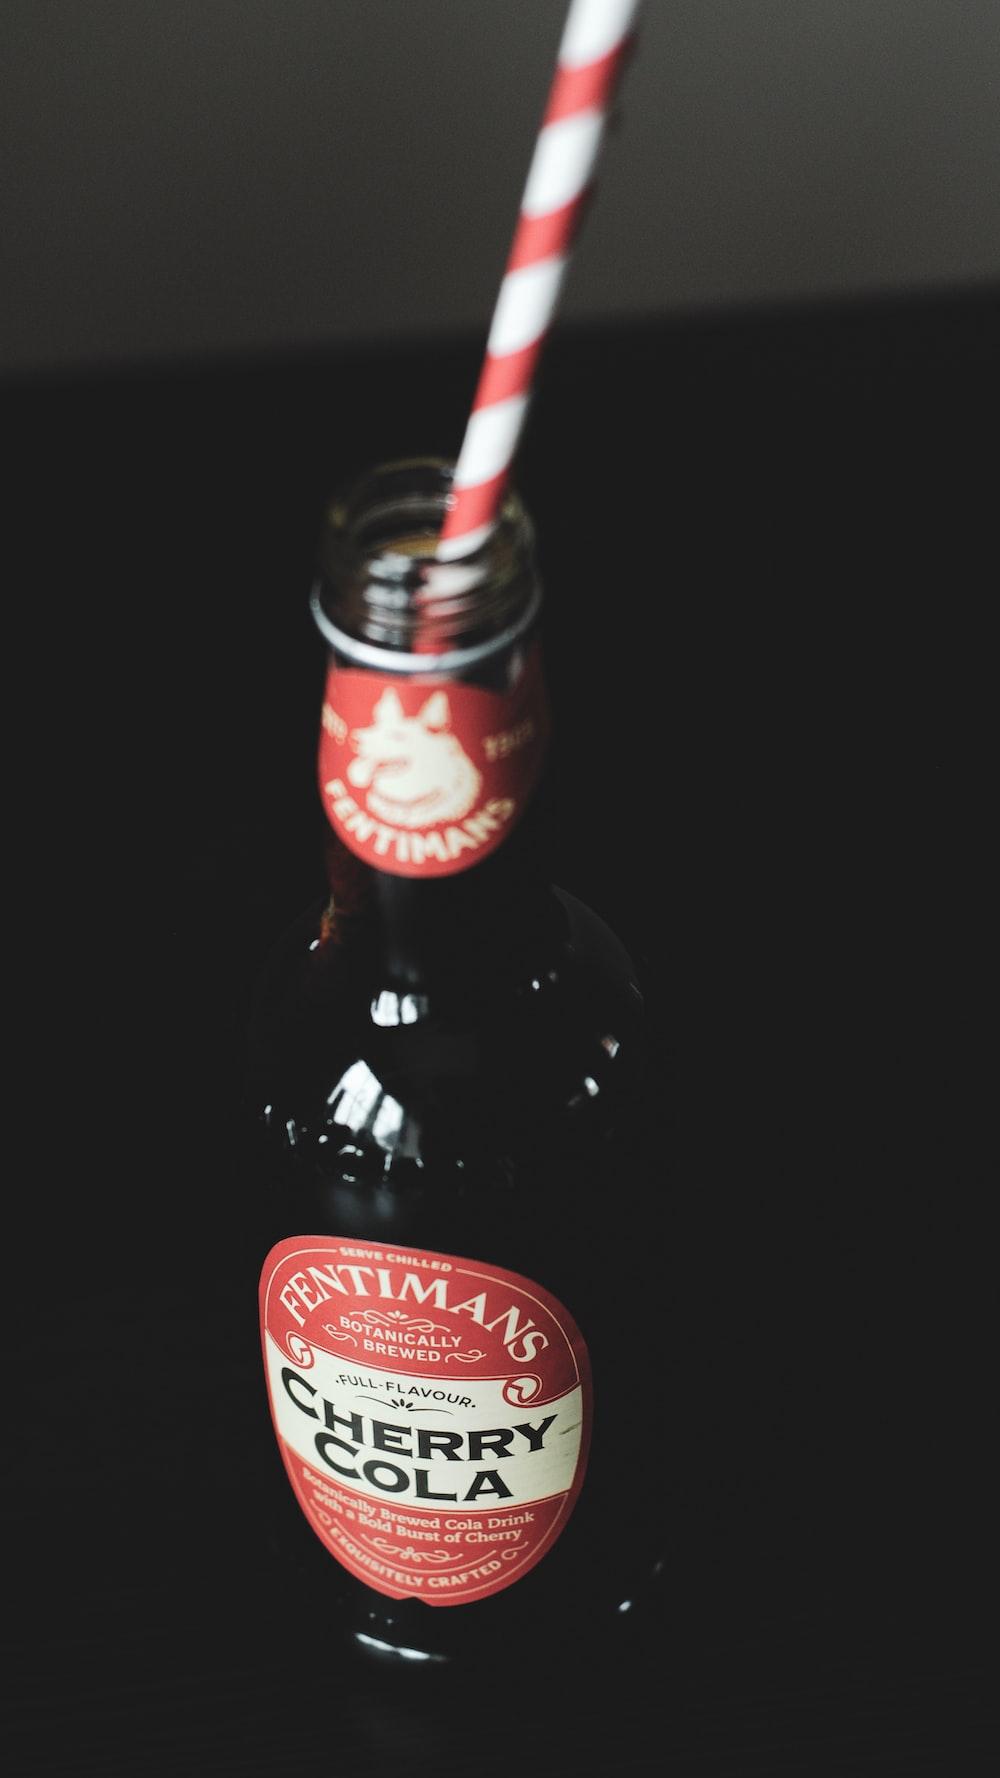 Fentiman's cherry cola bottle with straw